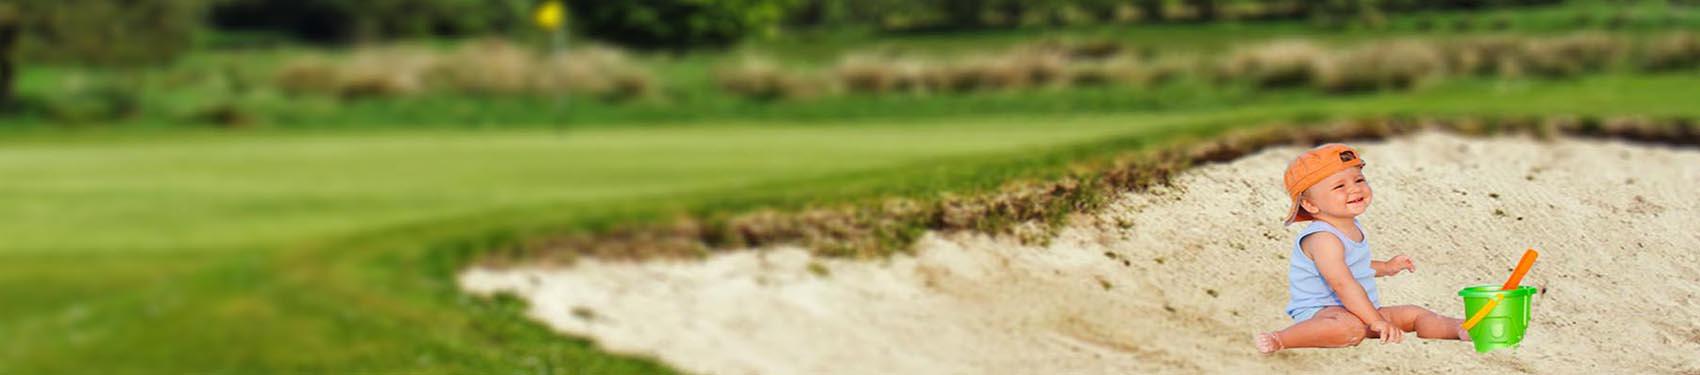 boy-toddler-golf-gifts